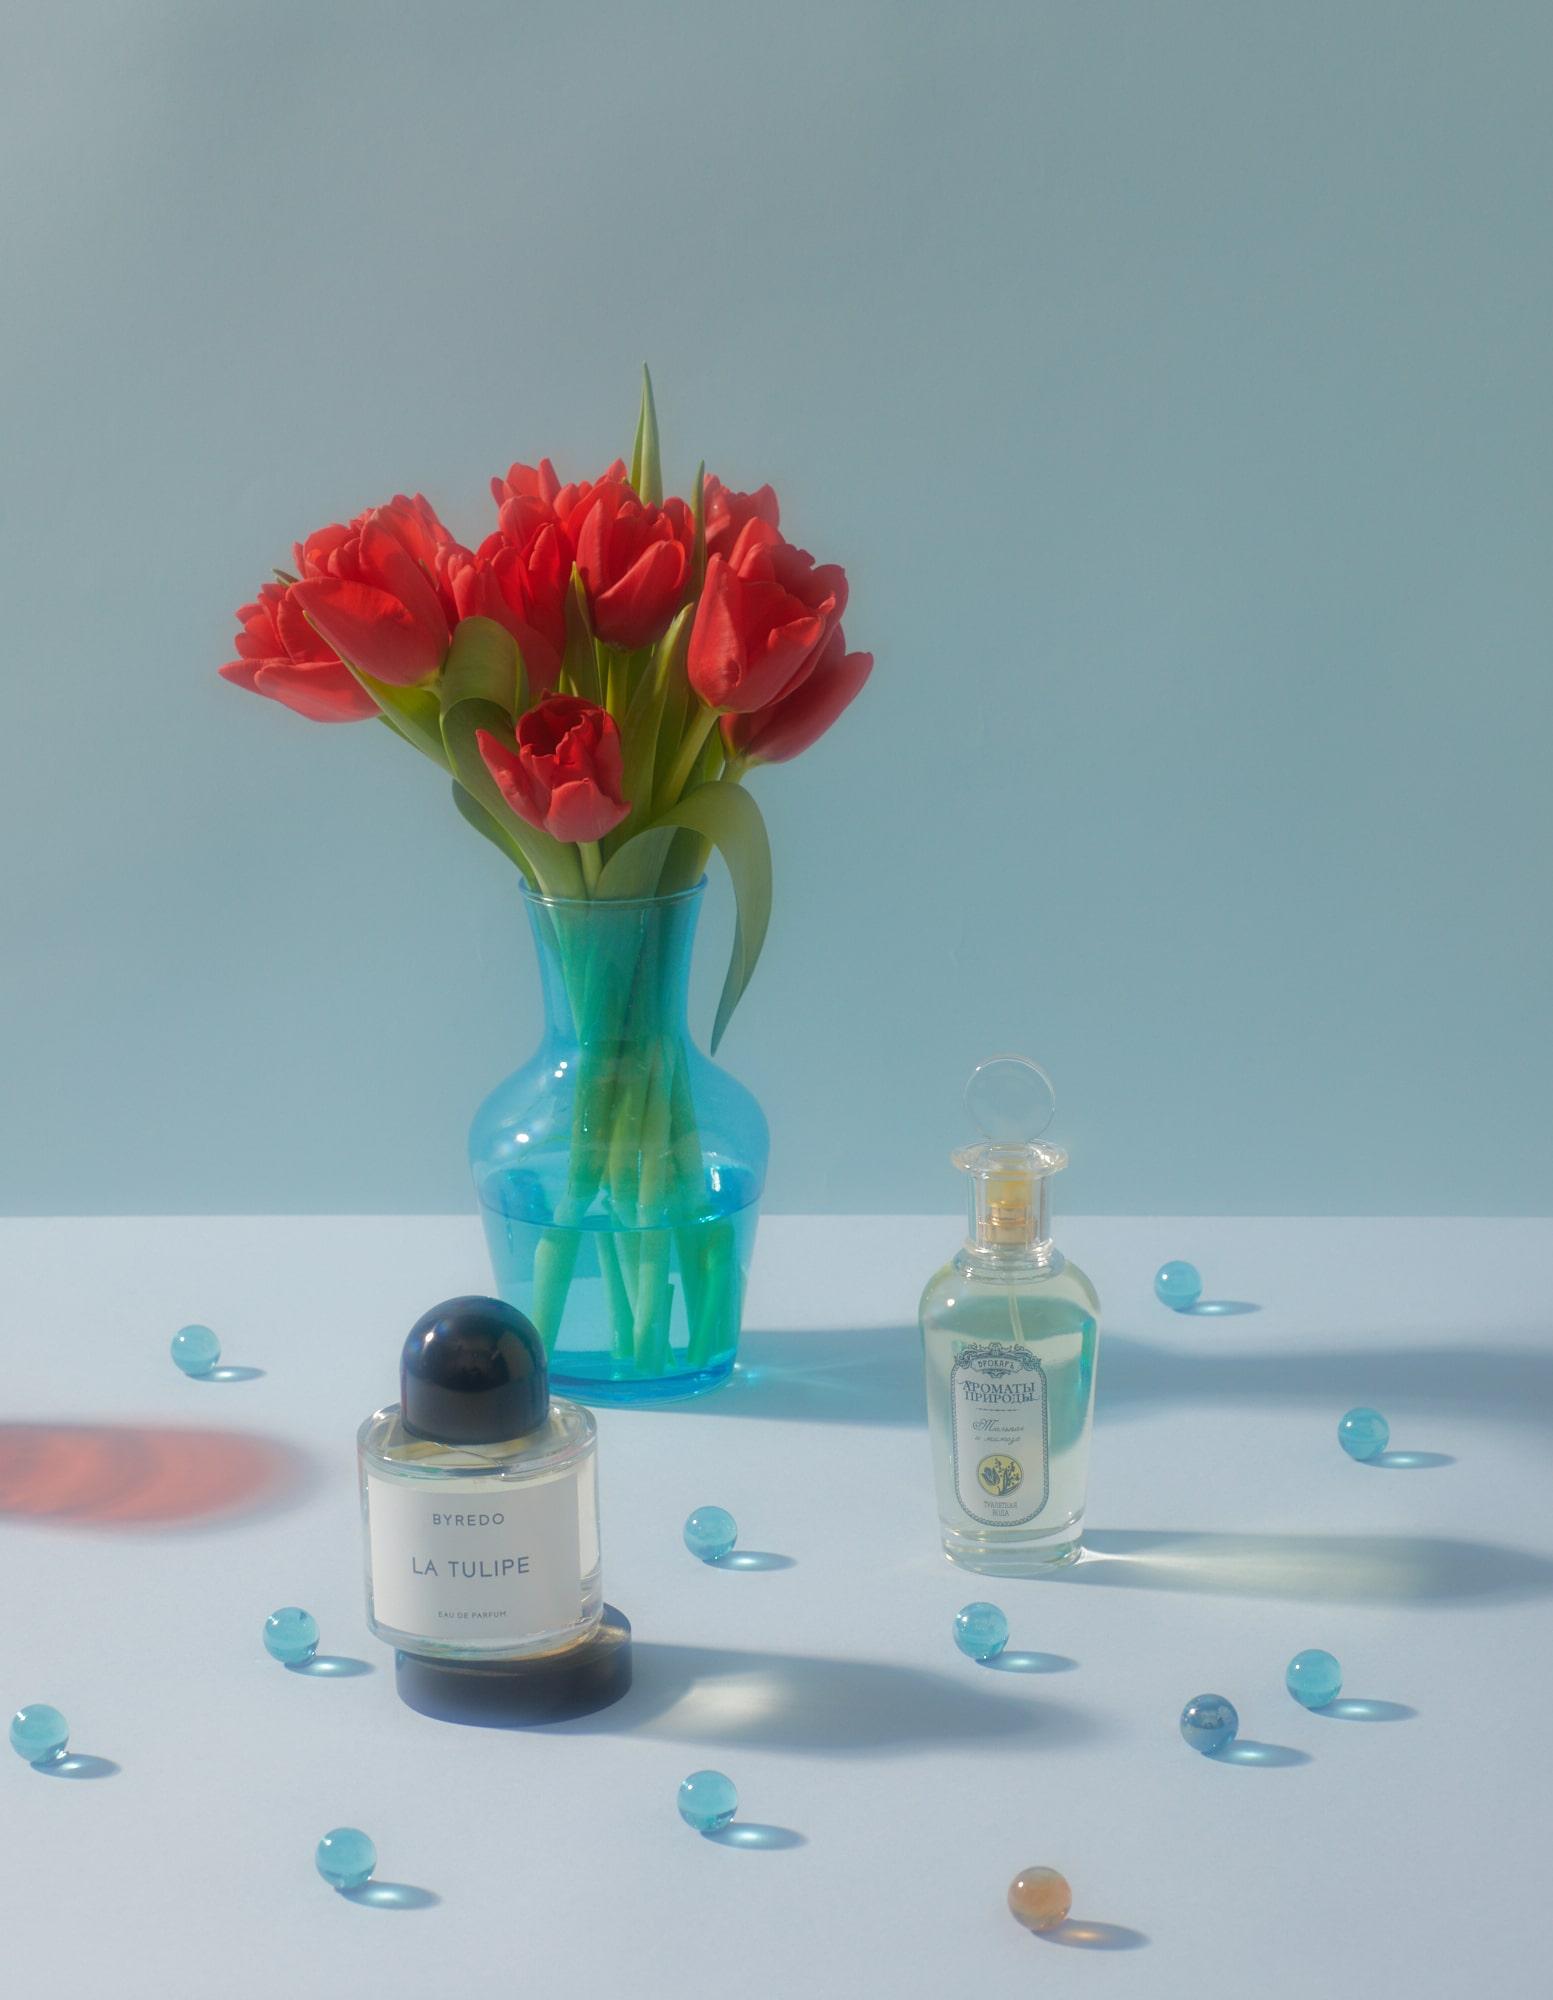 Духи с ароматом тюльпана